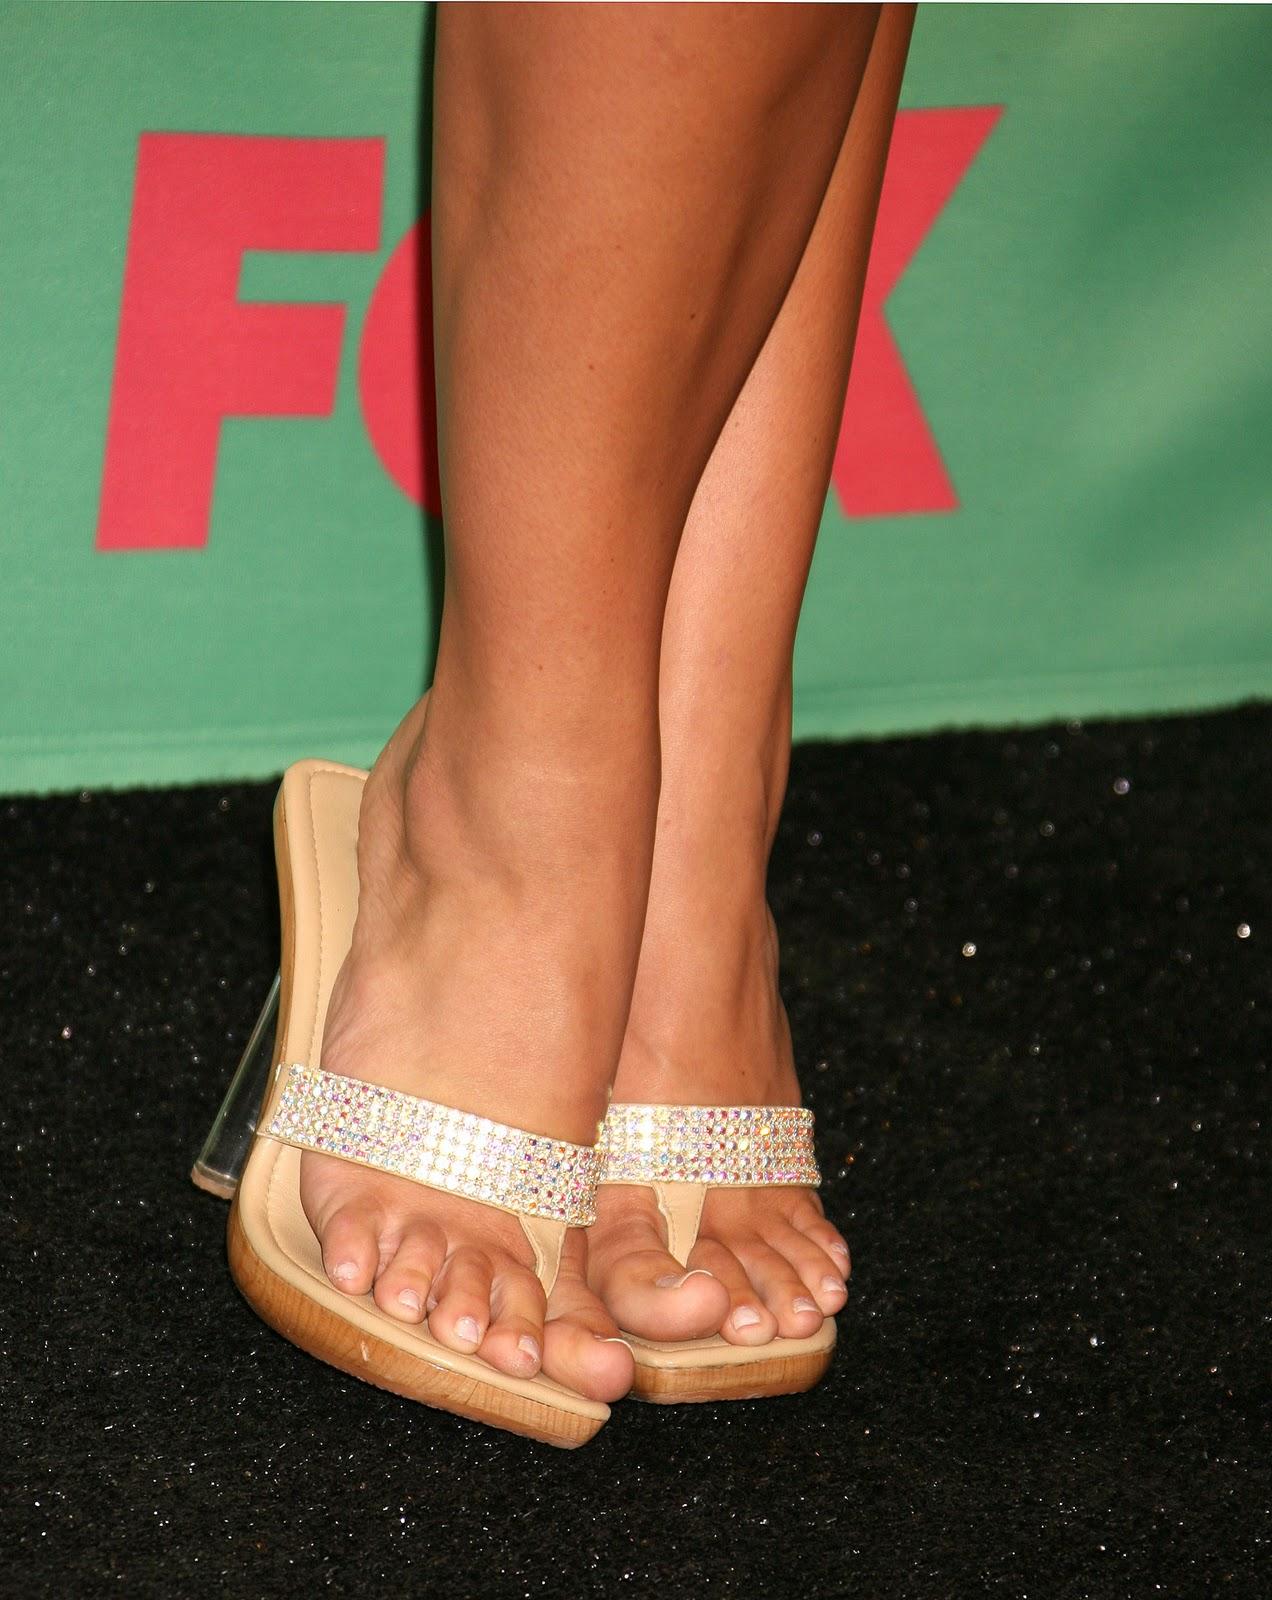 http://3.bp.blogspot.com/_WQmMWS-djIs/TO7jy1c3CkI/AAAAAAAANqc/3Pg4nYHgrC0/s1600/Brooke-Hogan-Feet-146231.jpg